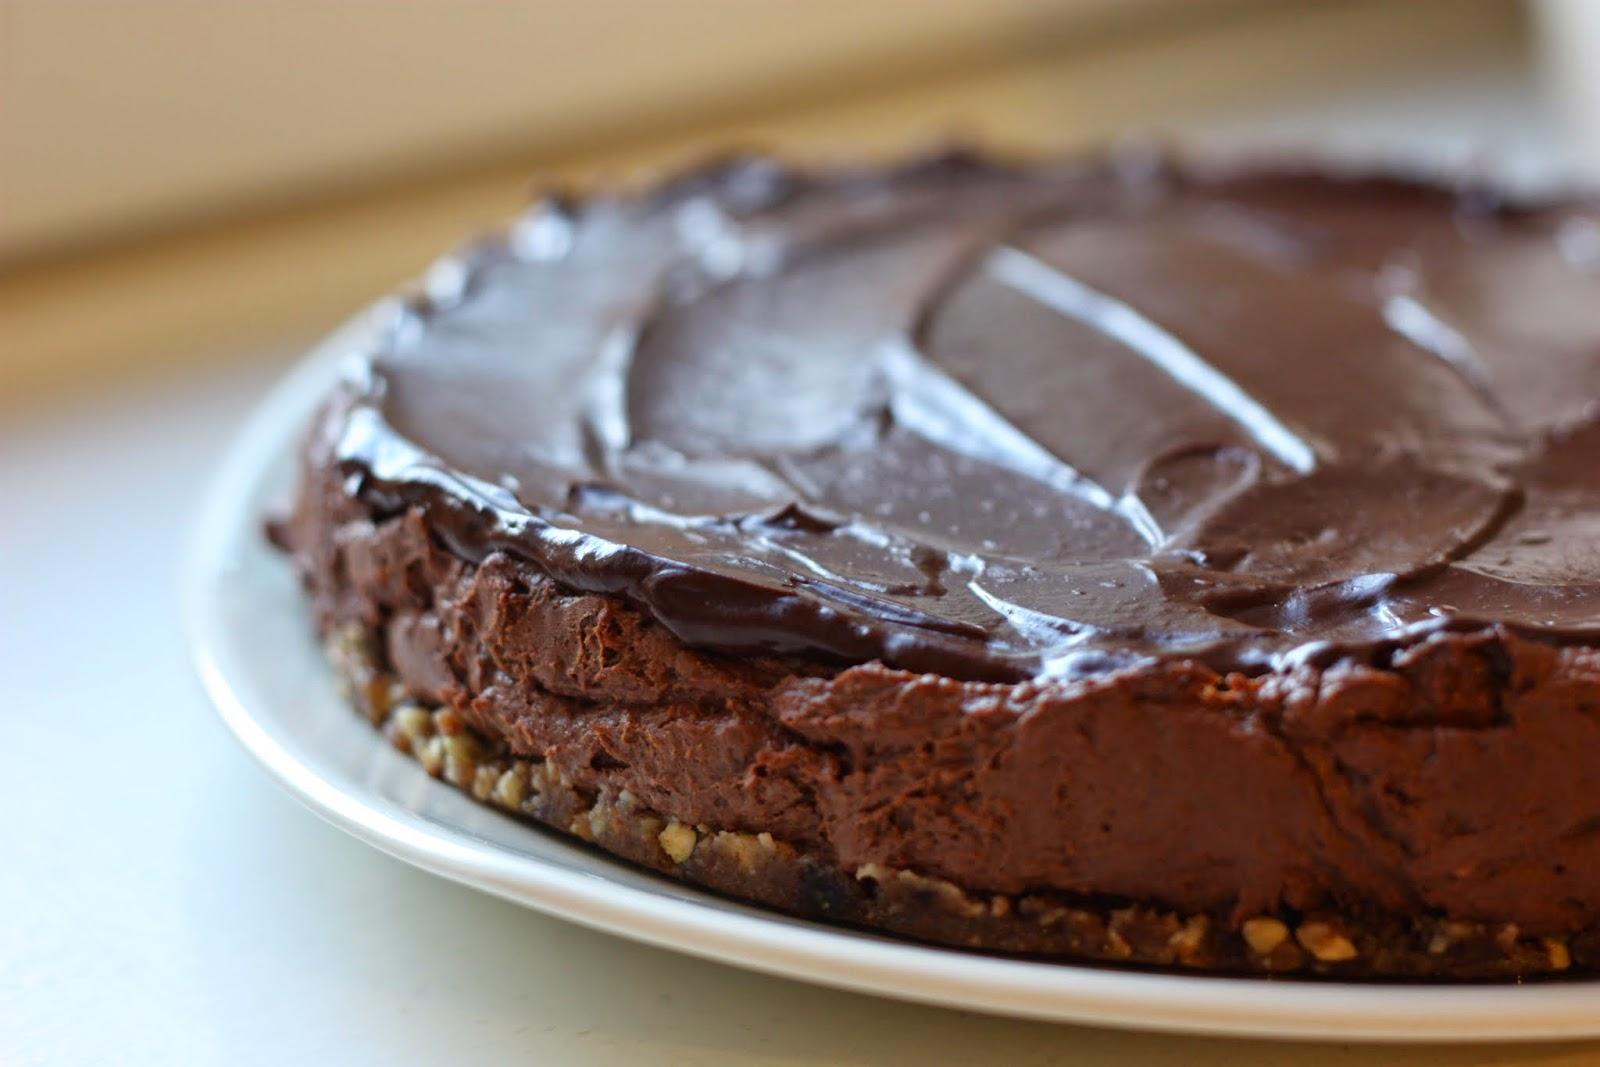 les petits plats de rose tarte la mousse au chocolat v g tale fa on cheesecake vegan. Black Bedroom Furniture Sets. Home Design Ideas